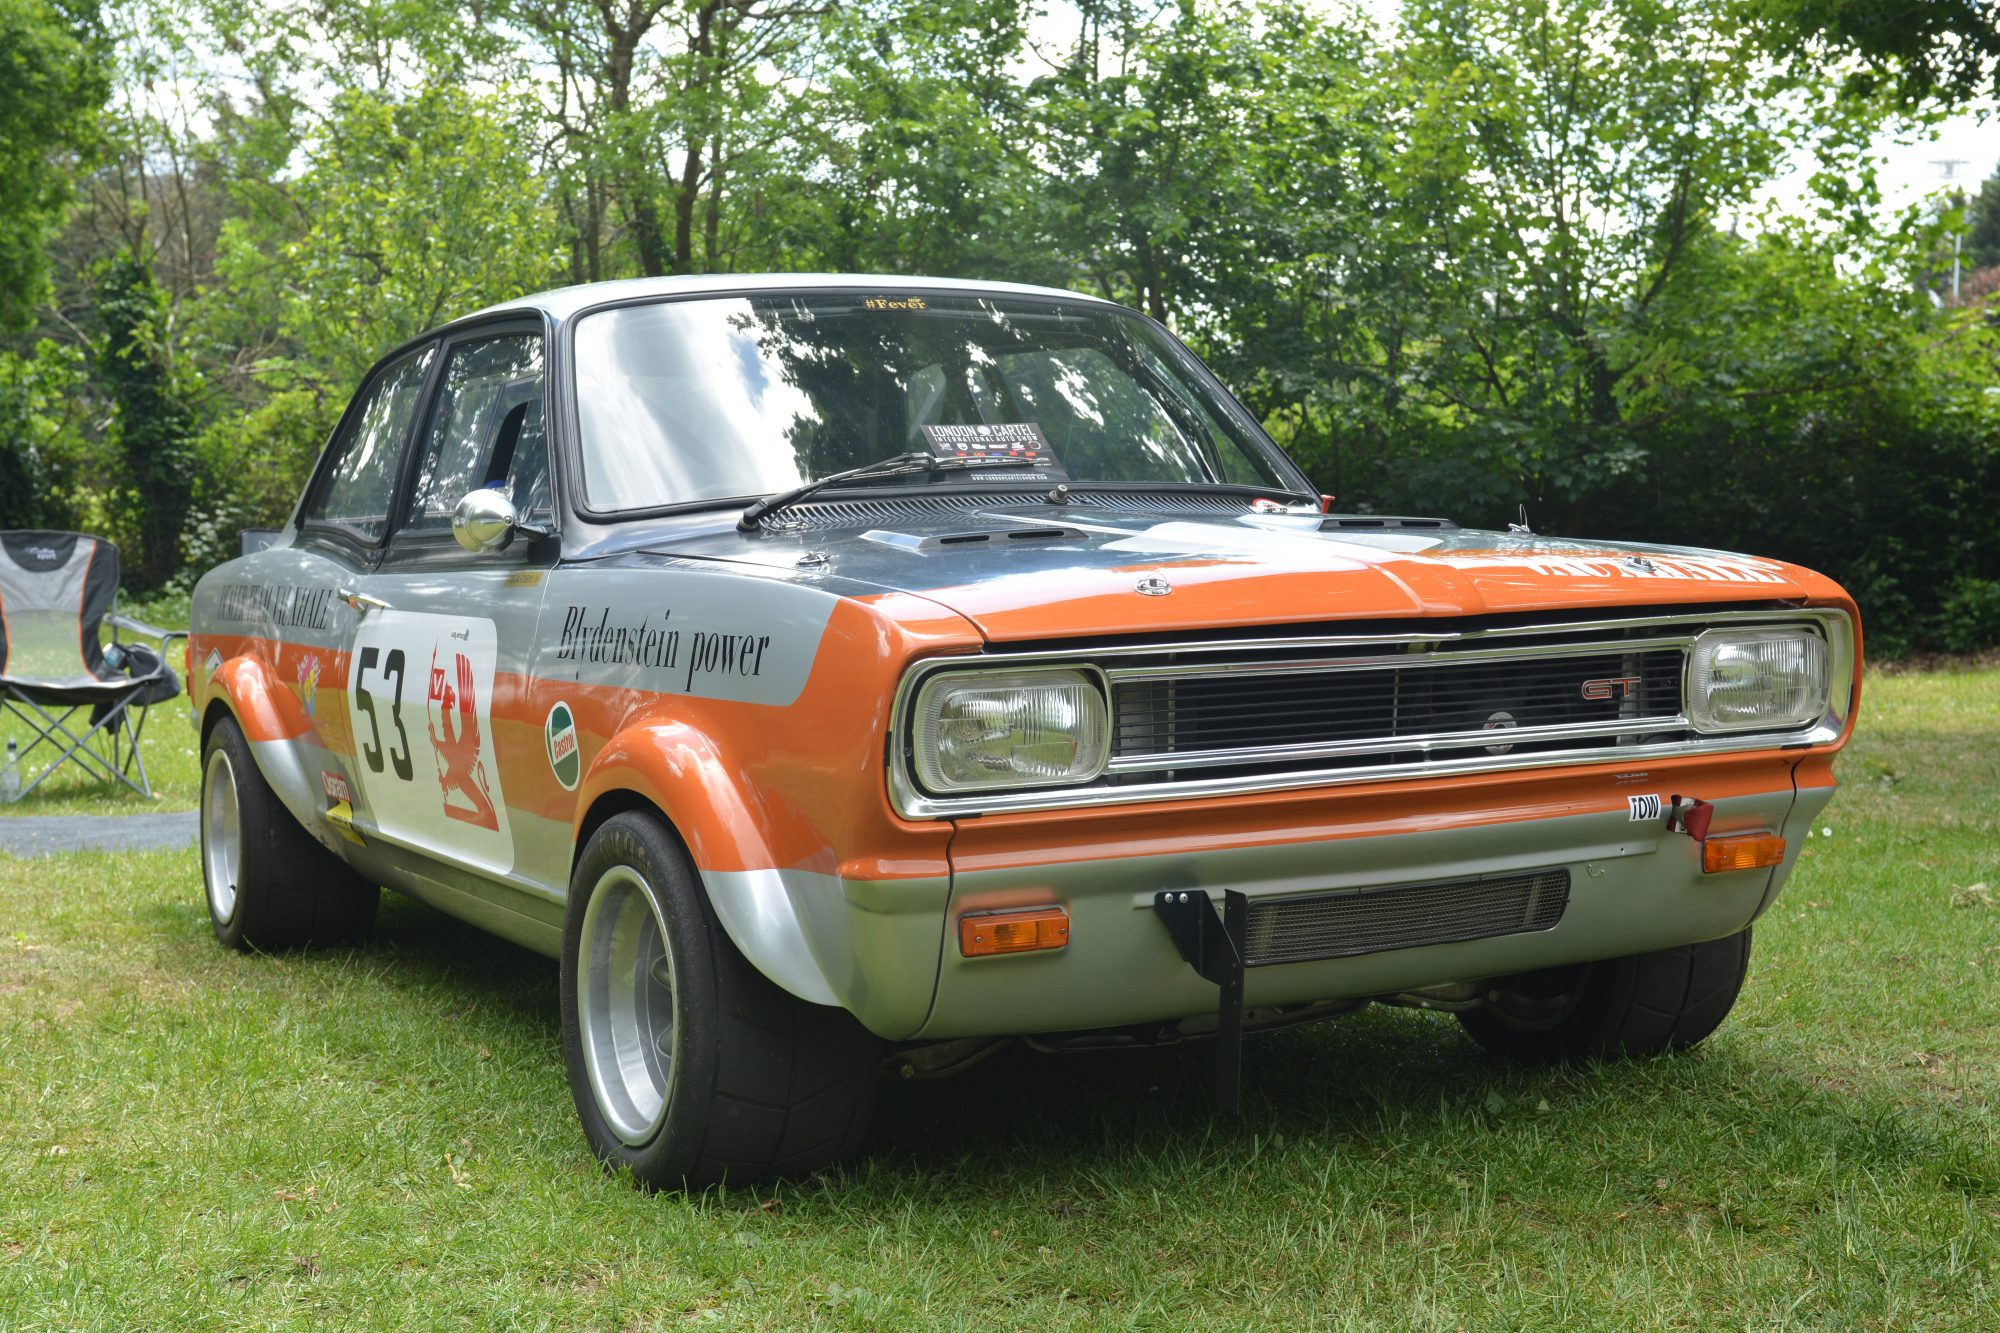 Motorsport, Motorsport at the Palace, Crystal Palace, London car show, classic car, show, classic motorsport, TR6, Vauxhall Viva GT